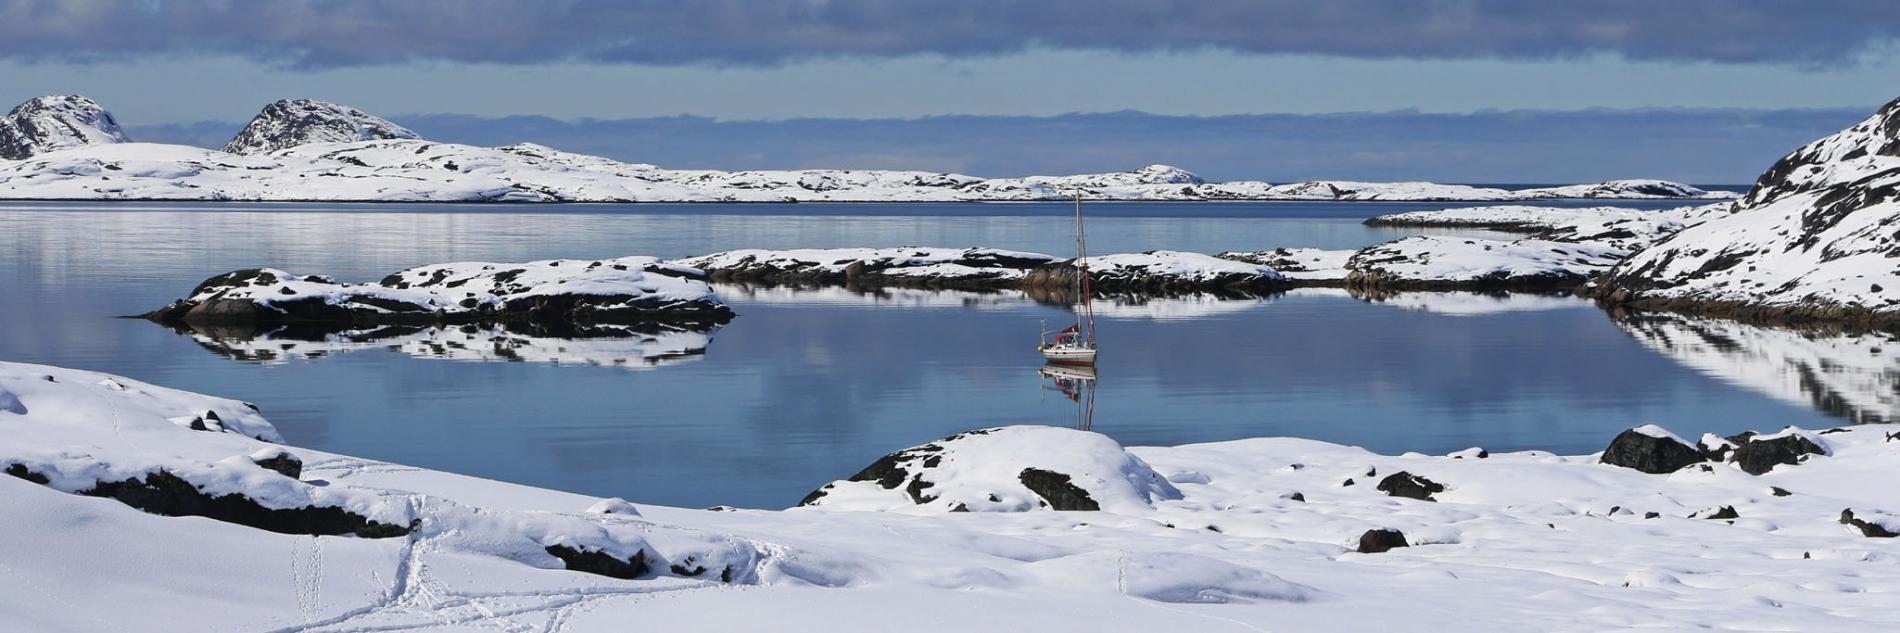 01_Grönland_gallery